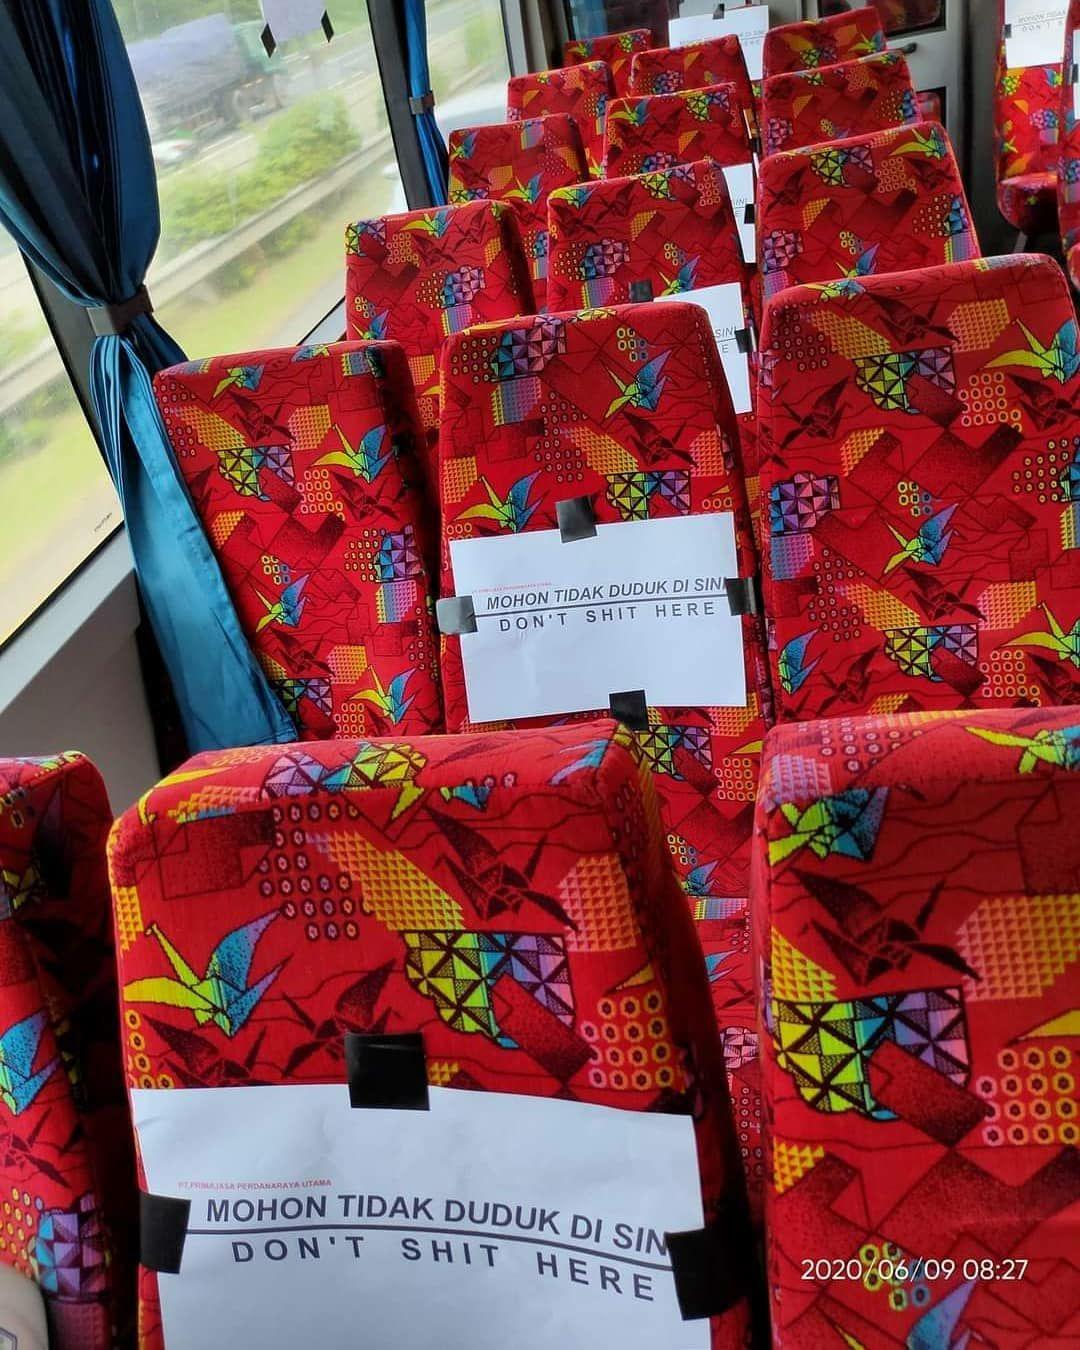 Social distancing rules on public transportation